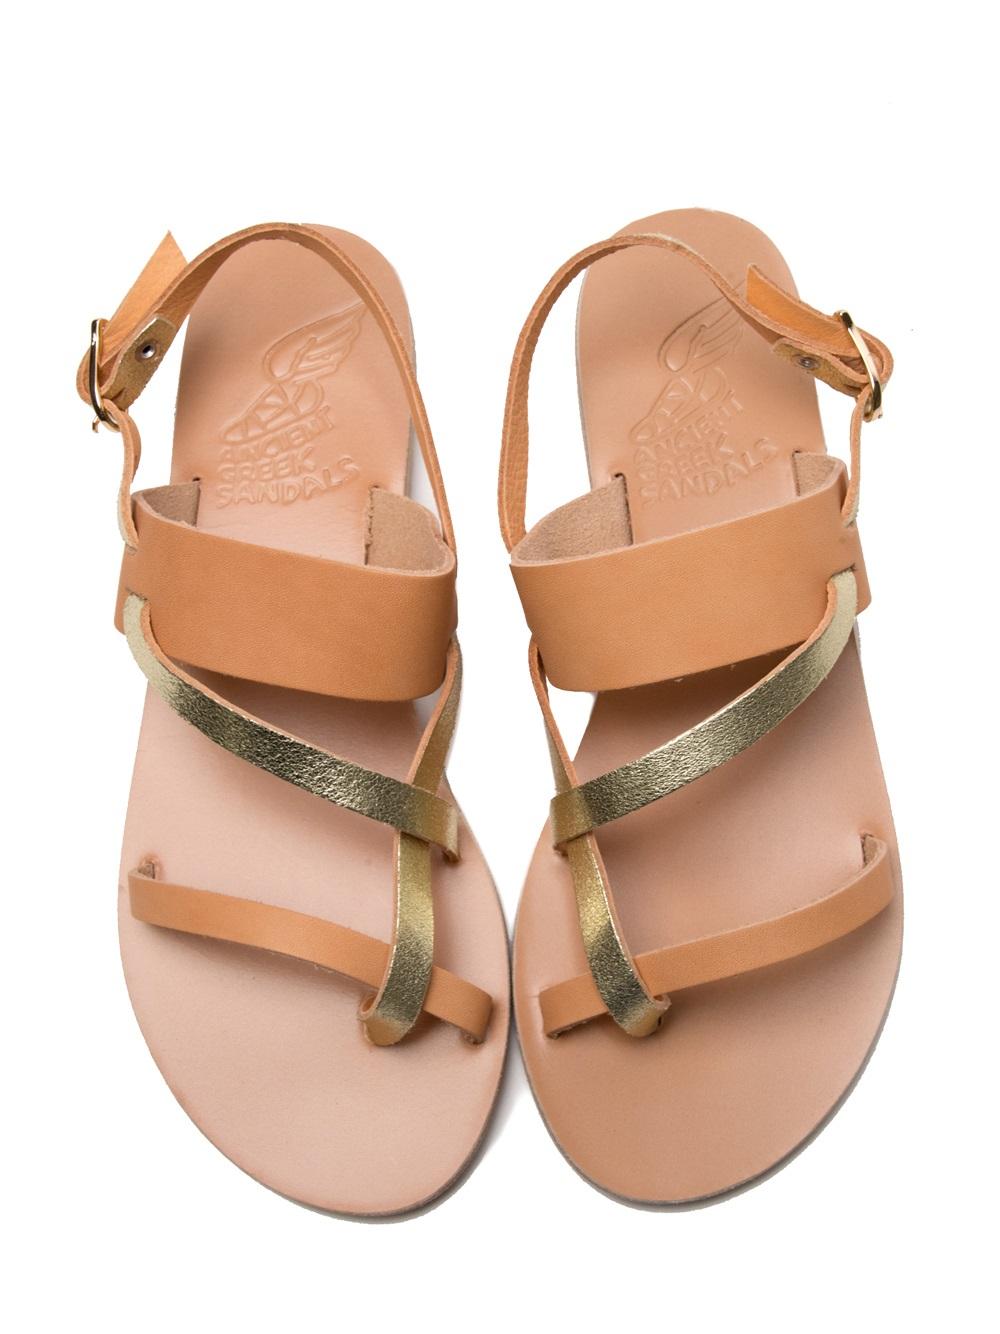 Ancient Greek Sandals Alethea Leather Slingback Sandal lCVJAoJ